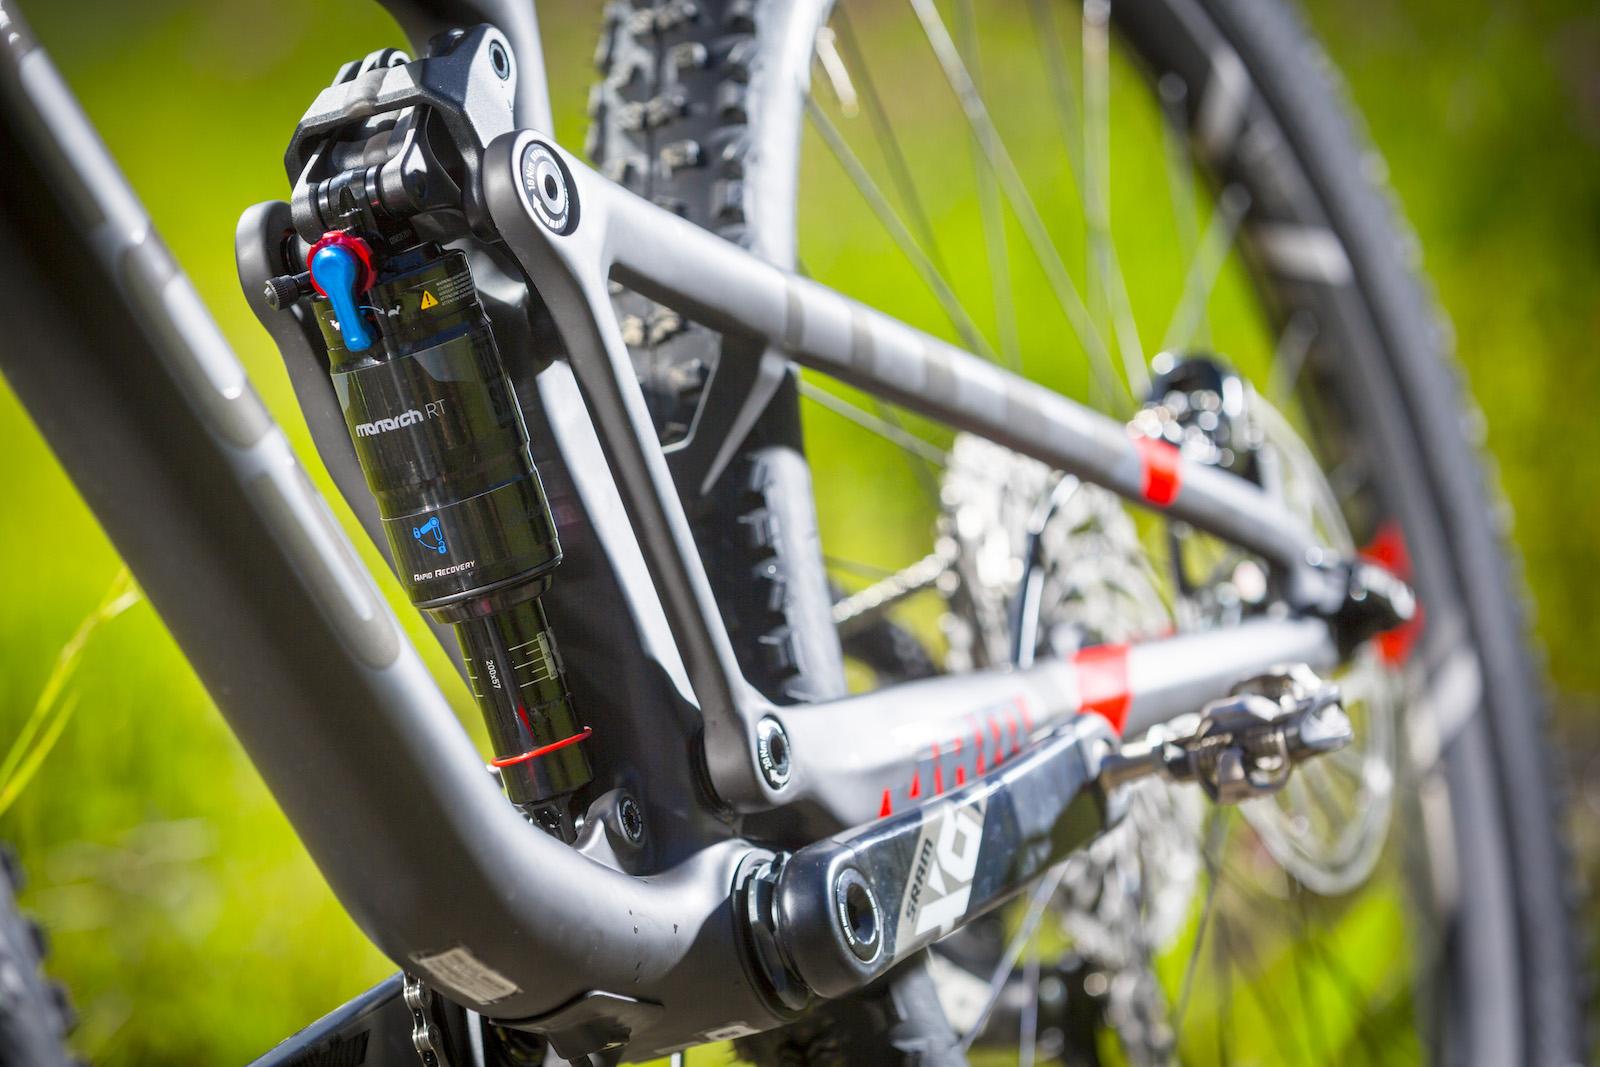 GD255770_Focus Morzine 2016 Bikes_Jam_